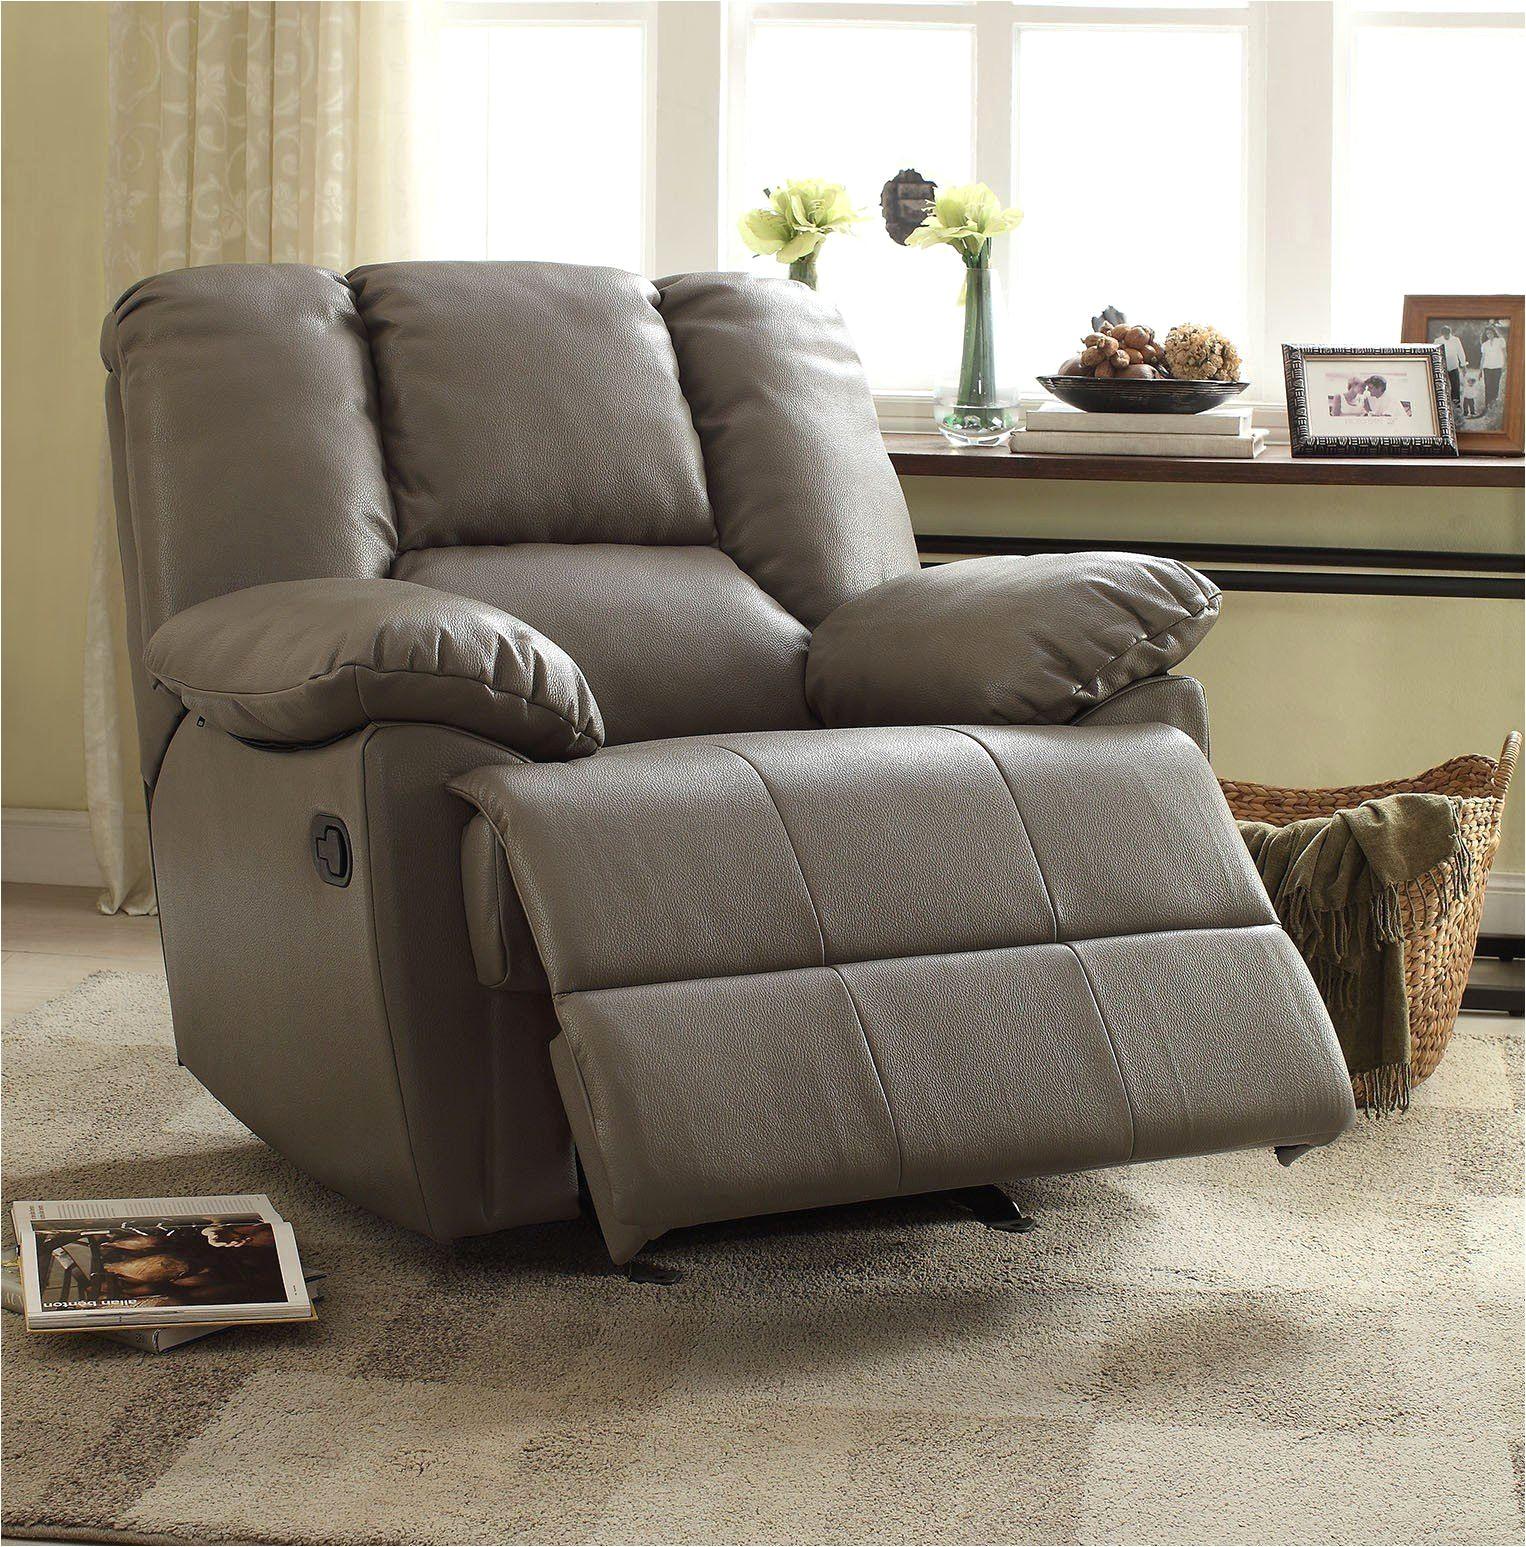 brown reclining sofa new furniture sleeper loveseat inspirational wicker outdoor sofa 0d anissa sofa gallery from big lots